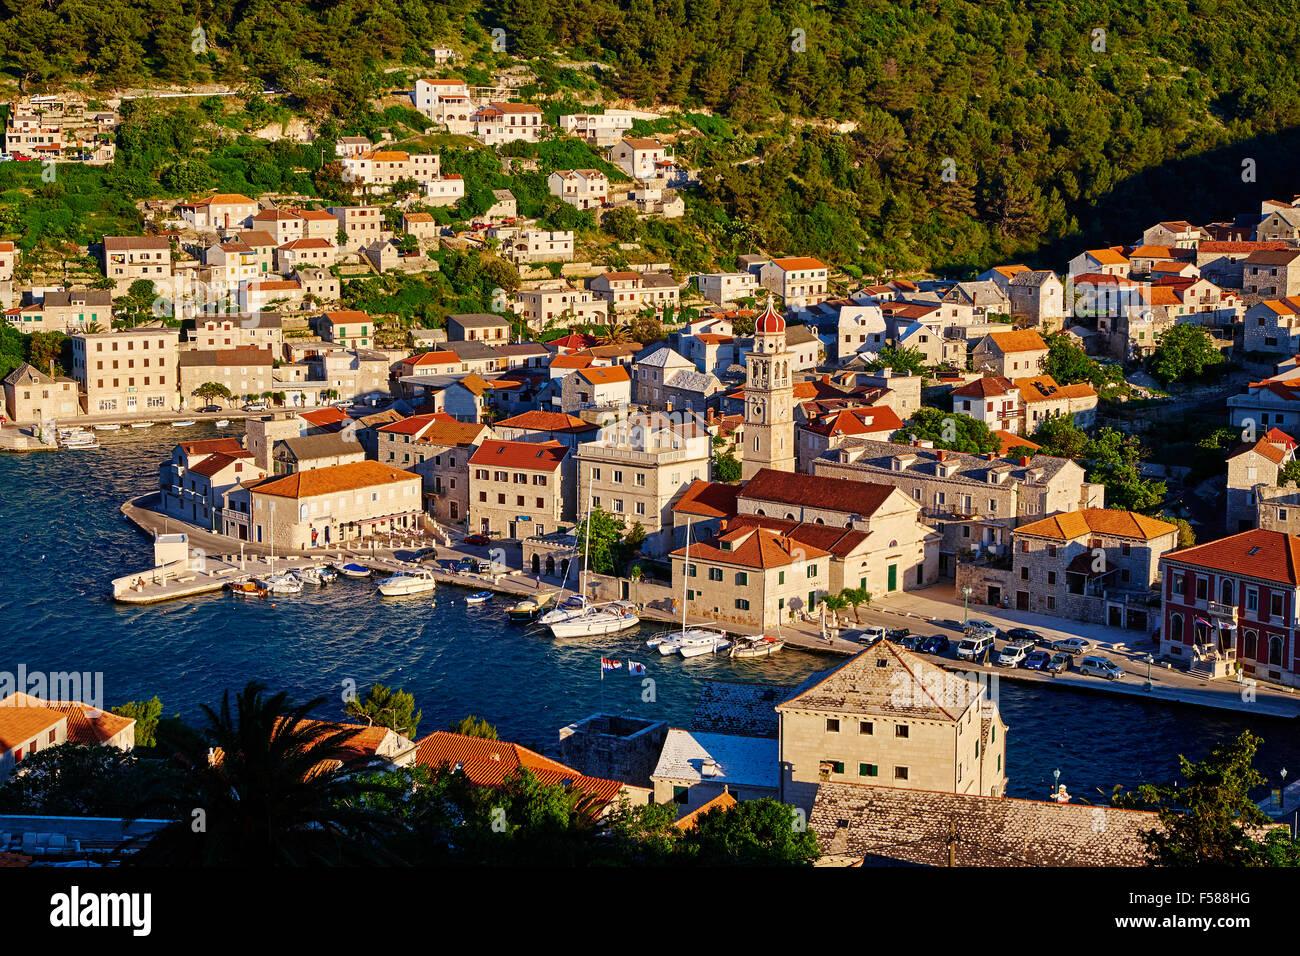 Croatia, Dalmatia, Brac island, Pucisca village - Stock Image